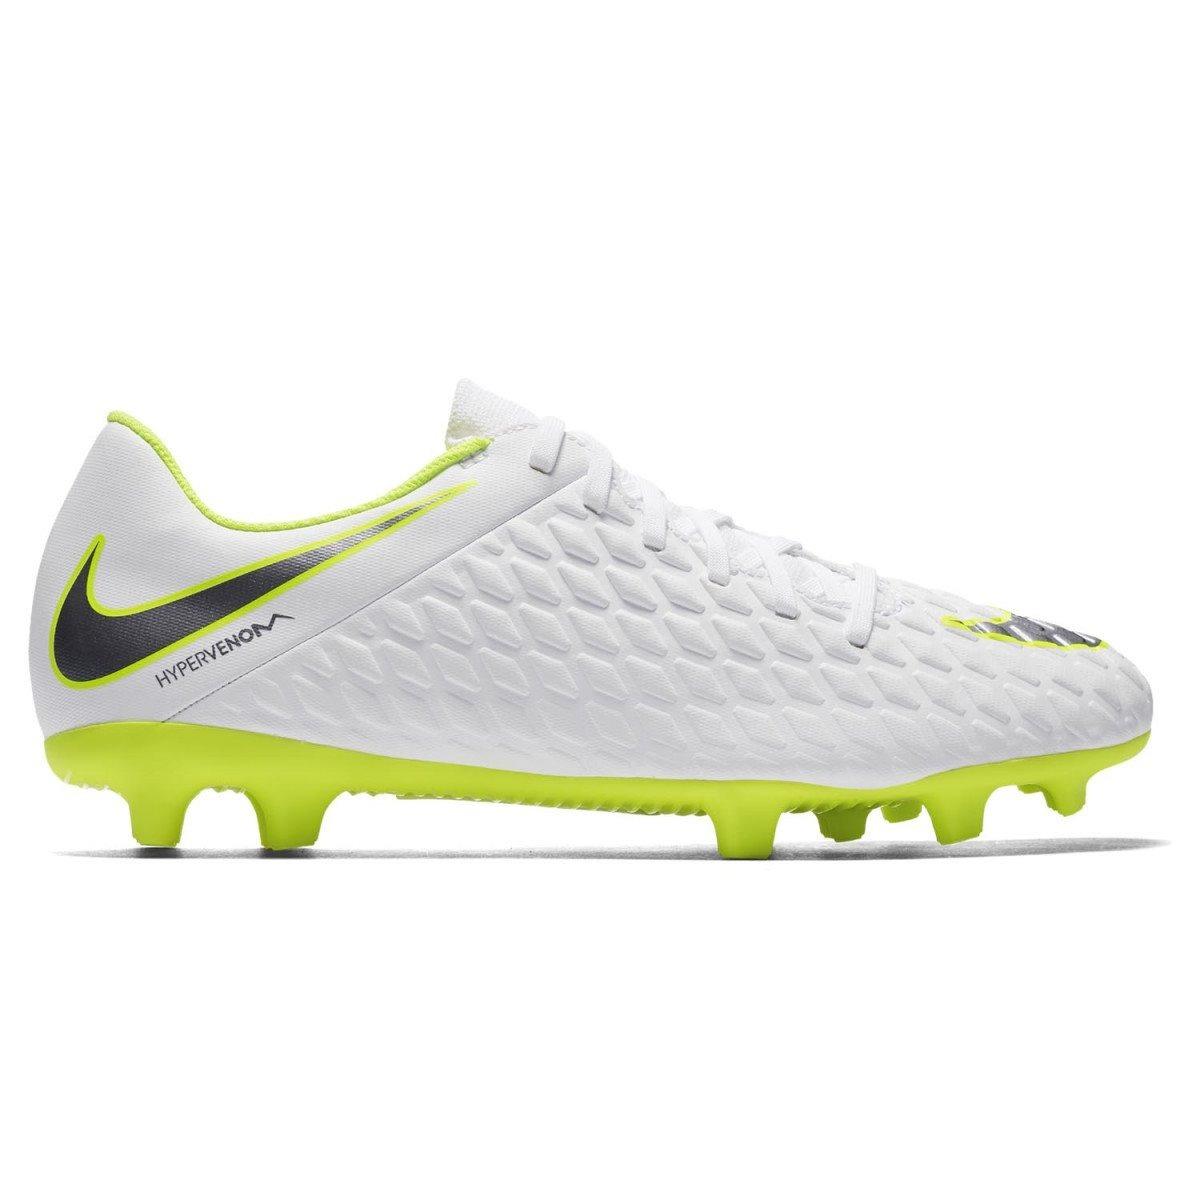 b1f715a211c3f Tachones Nike Phantom Club Bco verde Originales Aj4145-107 ...